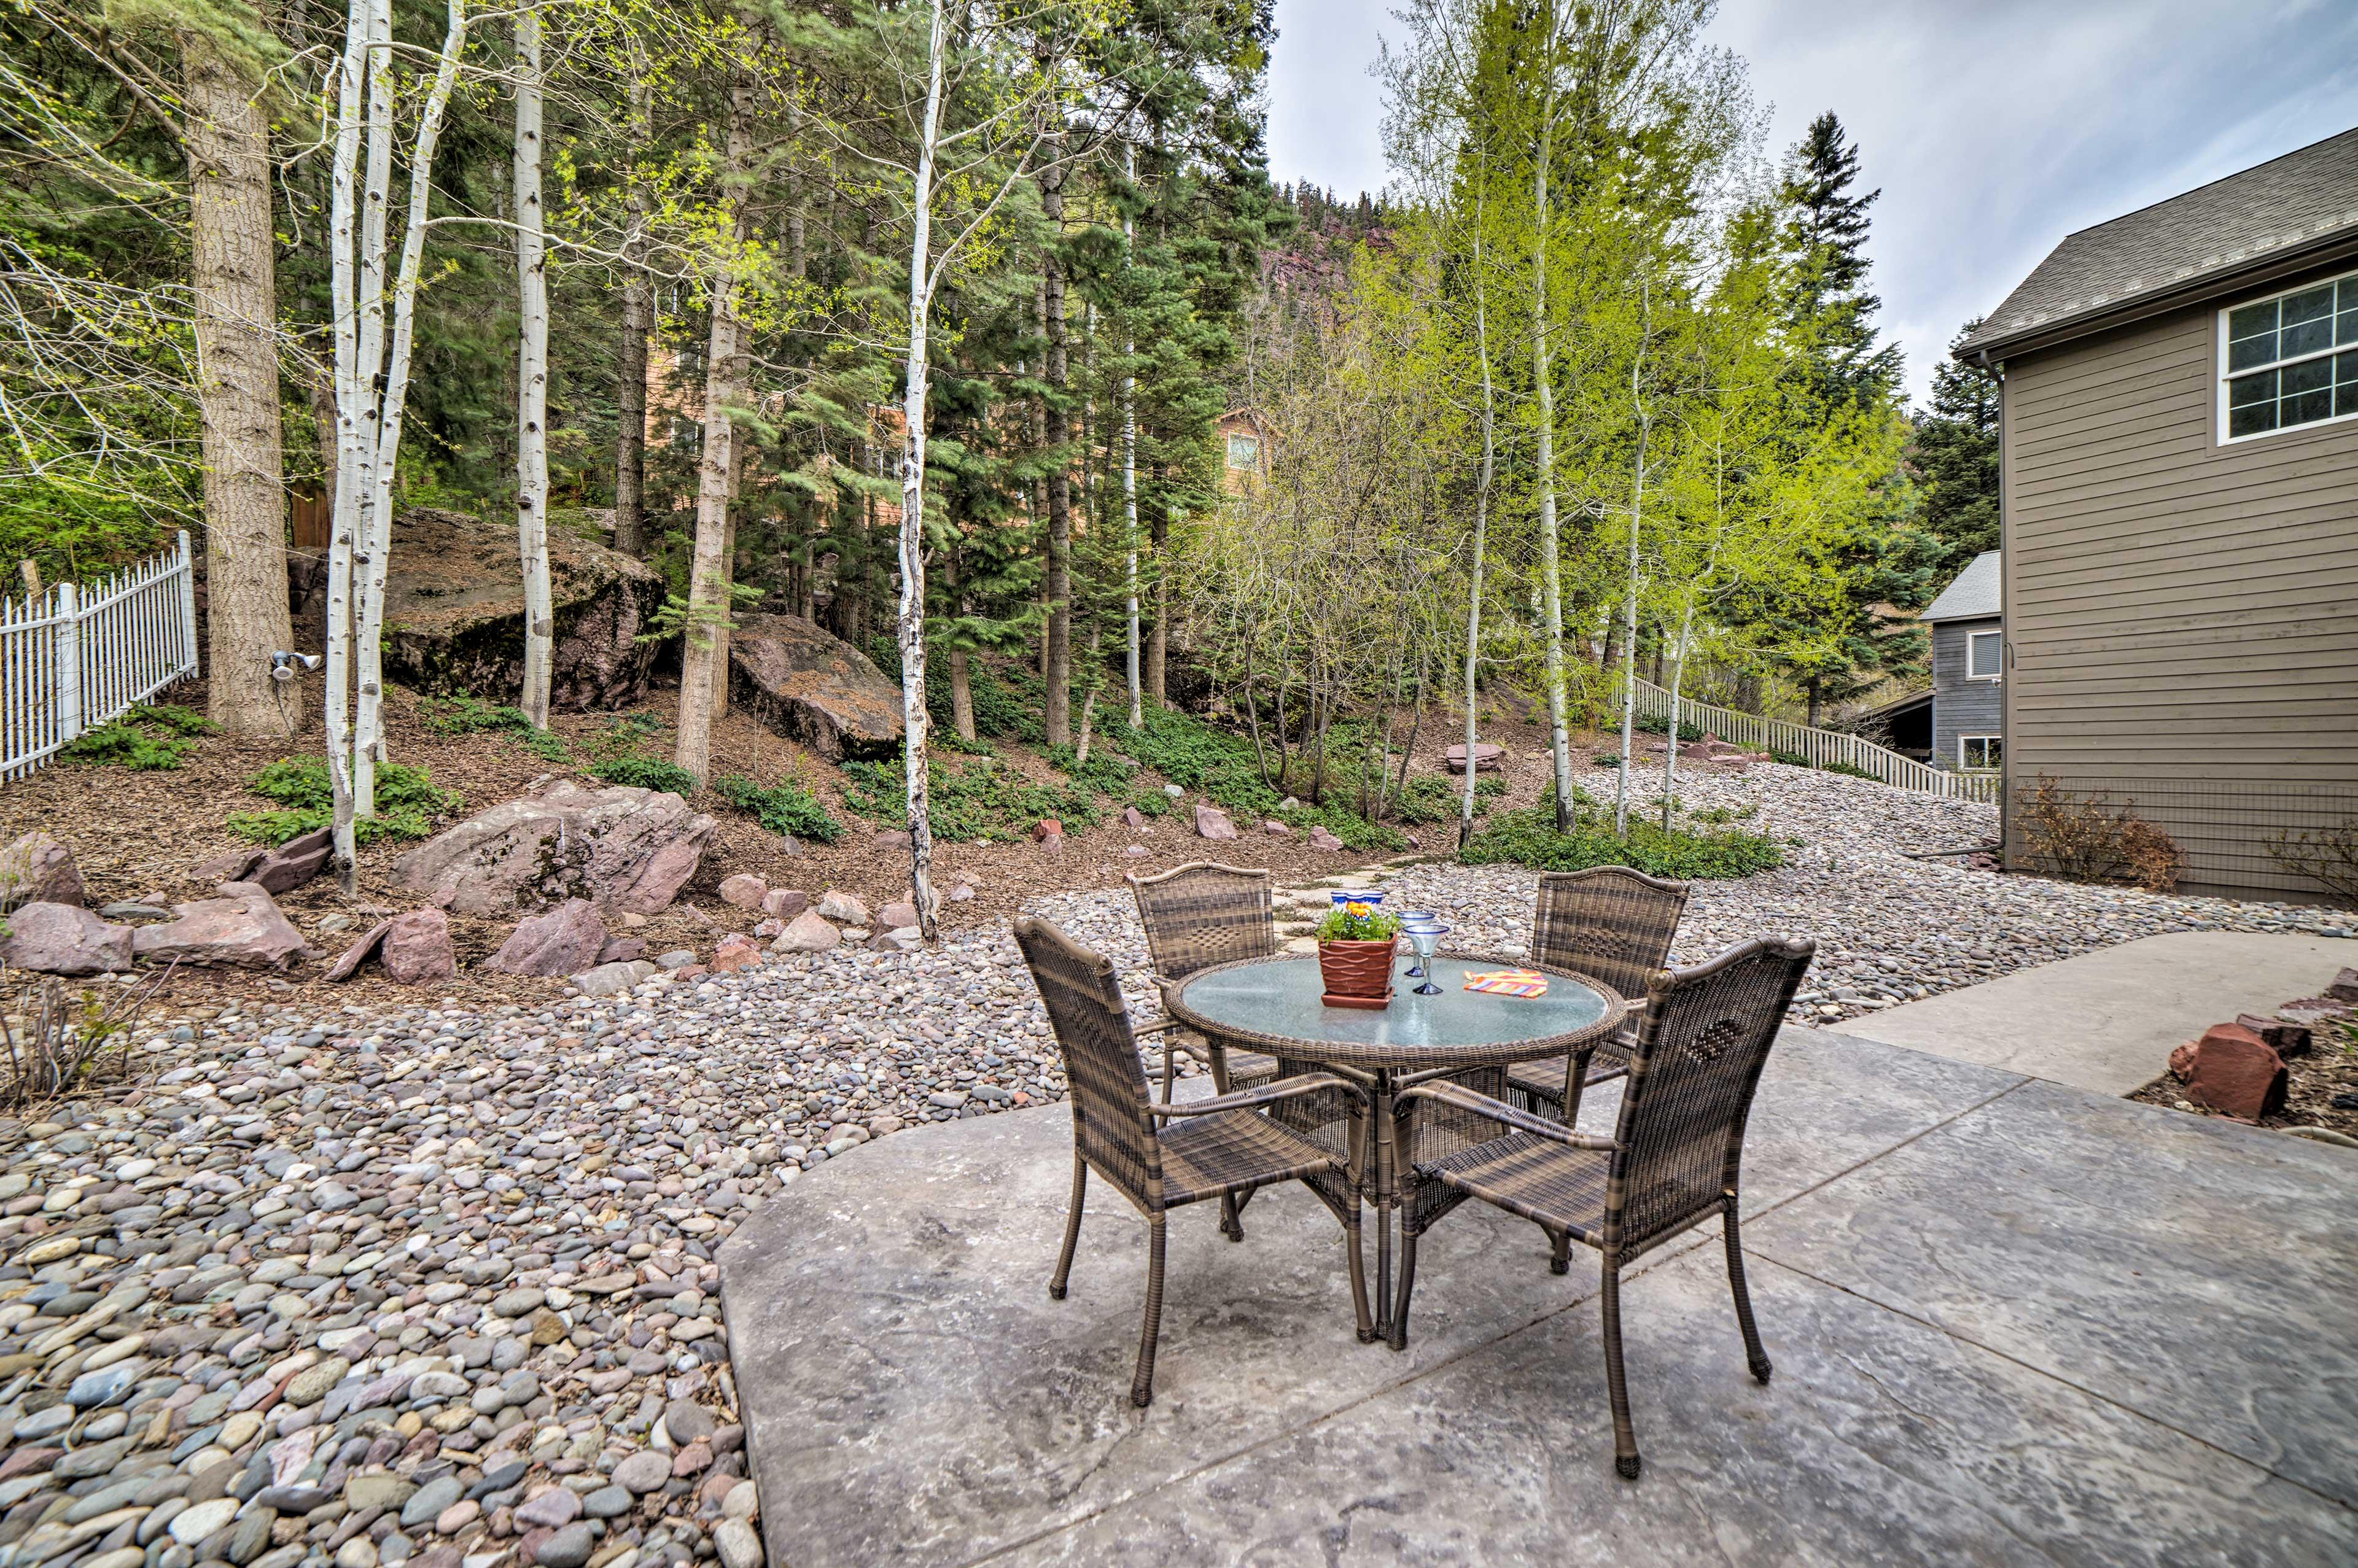 An aspen grove frames the private backyard.